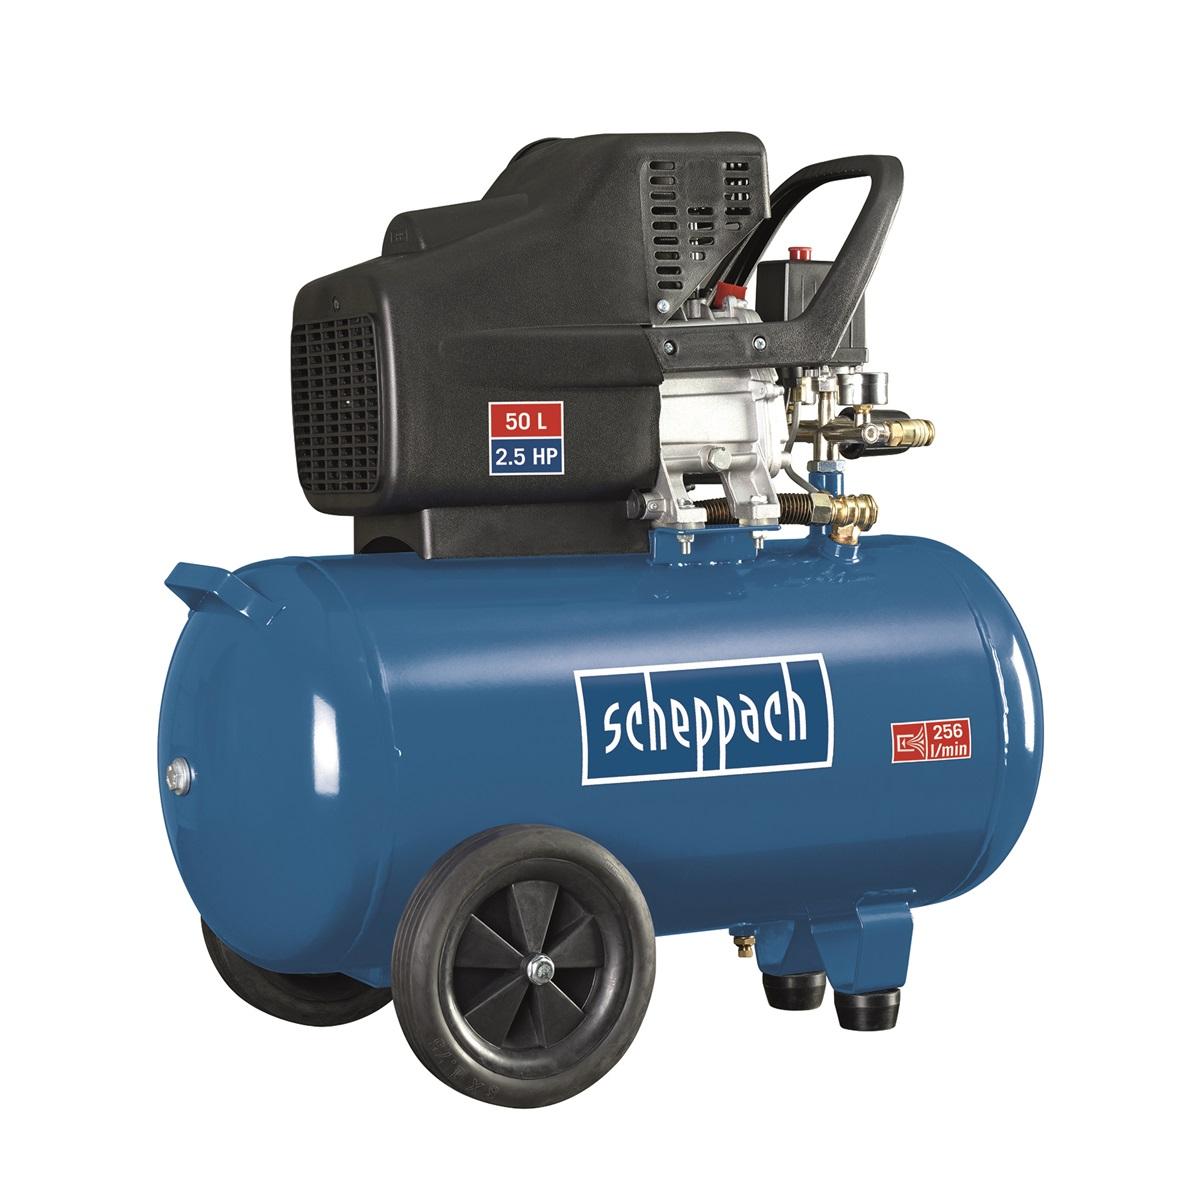 Olejový kompresor SCHEPPACH HC 51